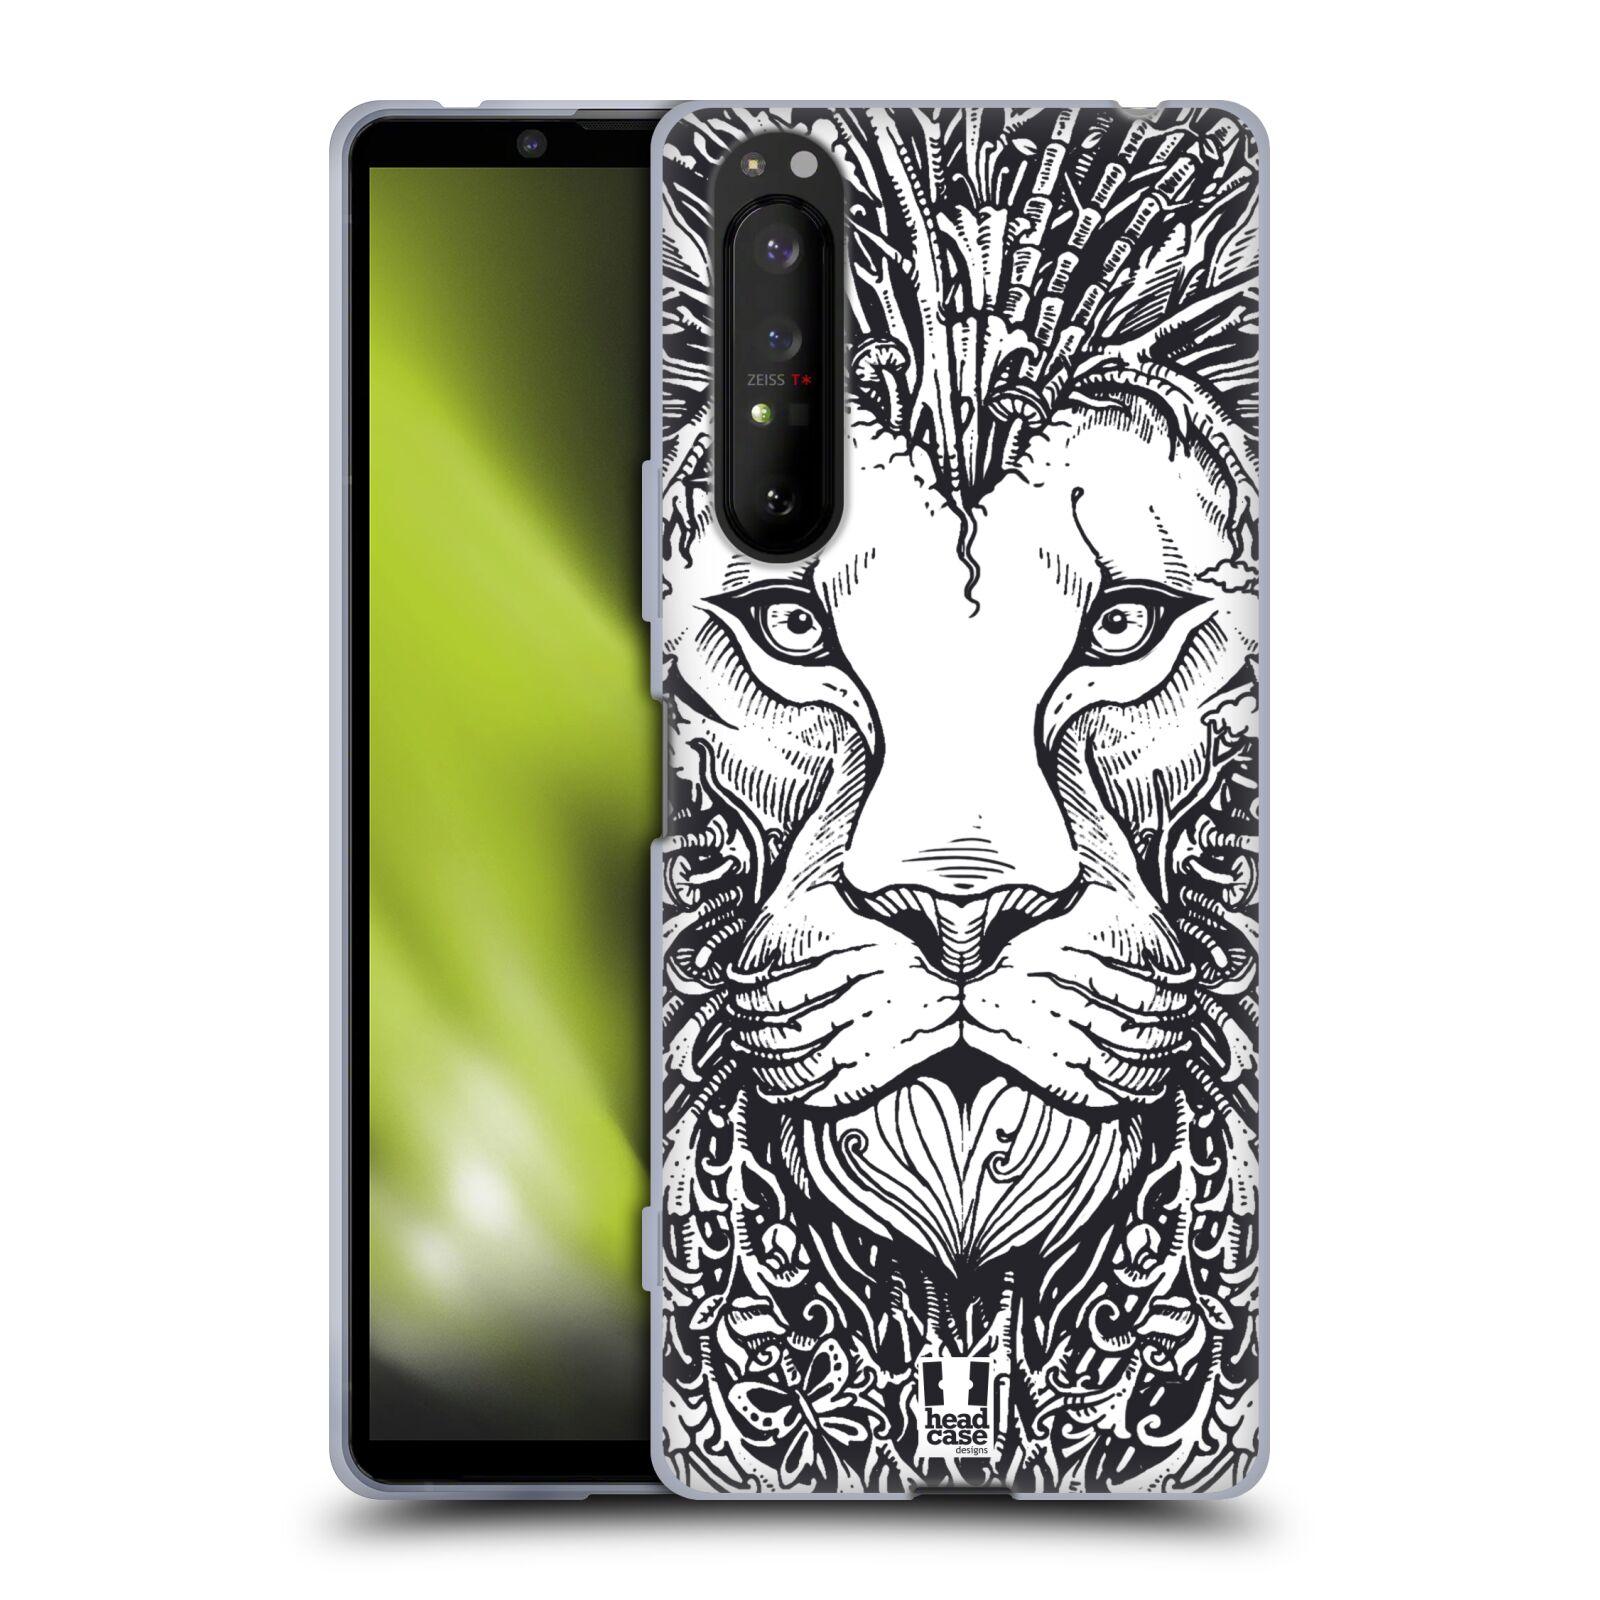 Silikonové pouzdro na mobil Sony Xperia 1 II - Head Case - DOODLE TVÁŘ LEV